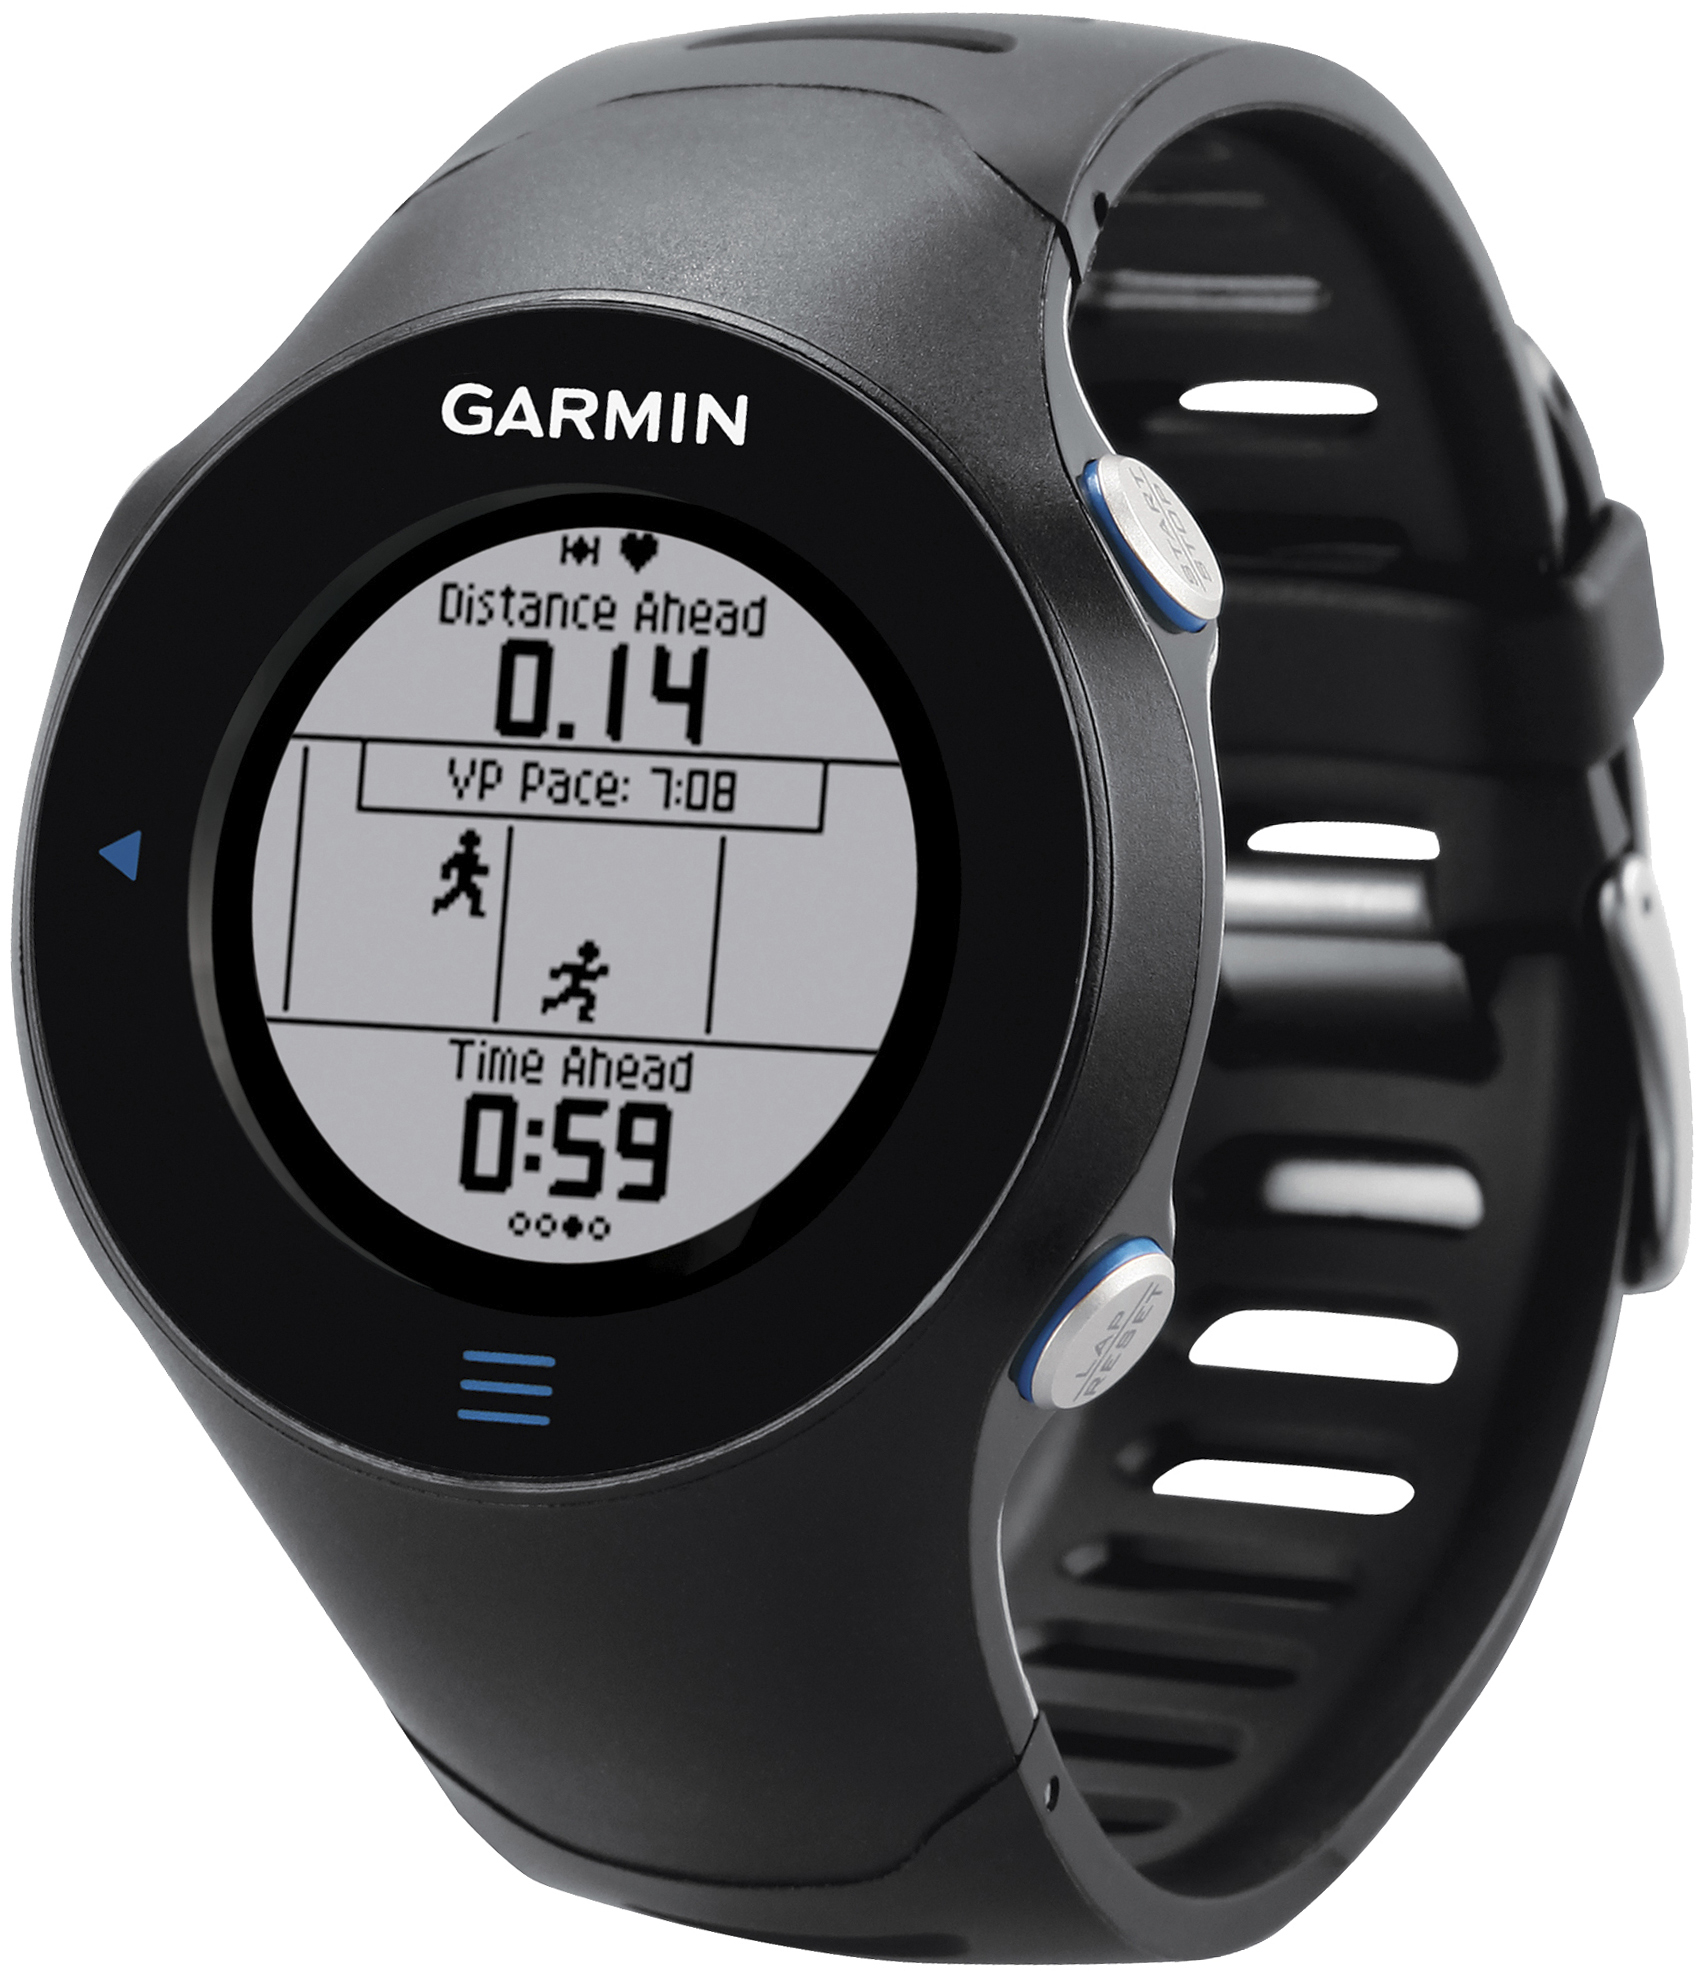 Garmin Forerunner 610 HRM GPS Watch - Unisex